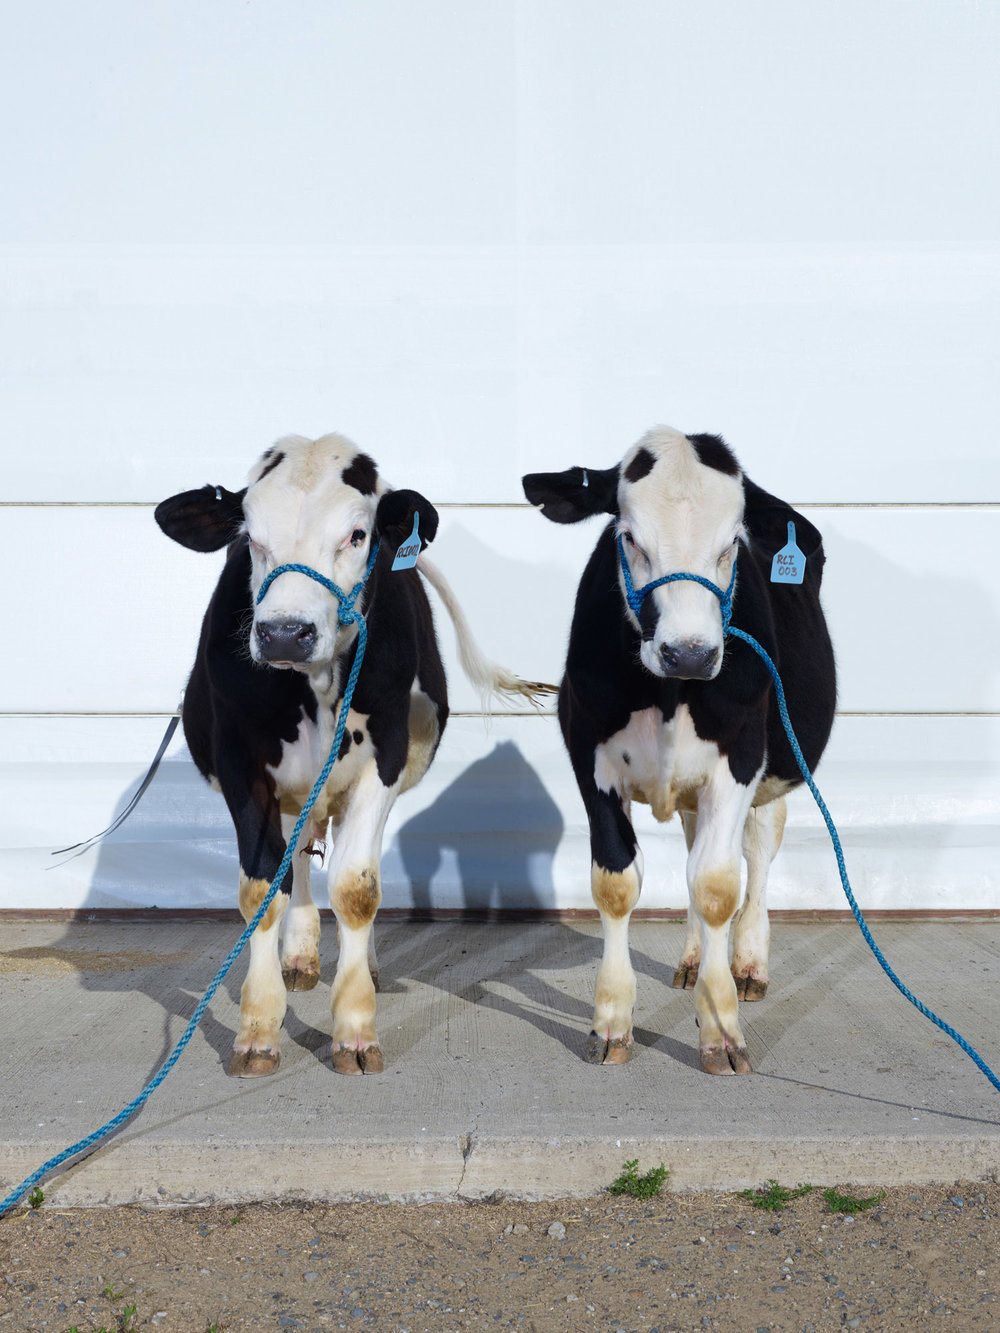 From a collaboration with Aleksandra Damonvić, genetically modified bulls, Davis, CA